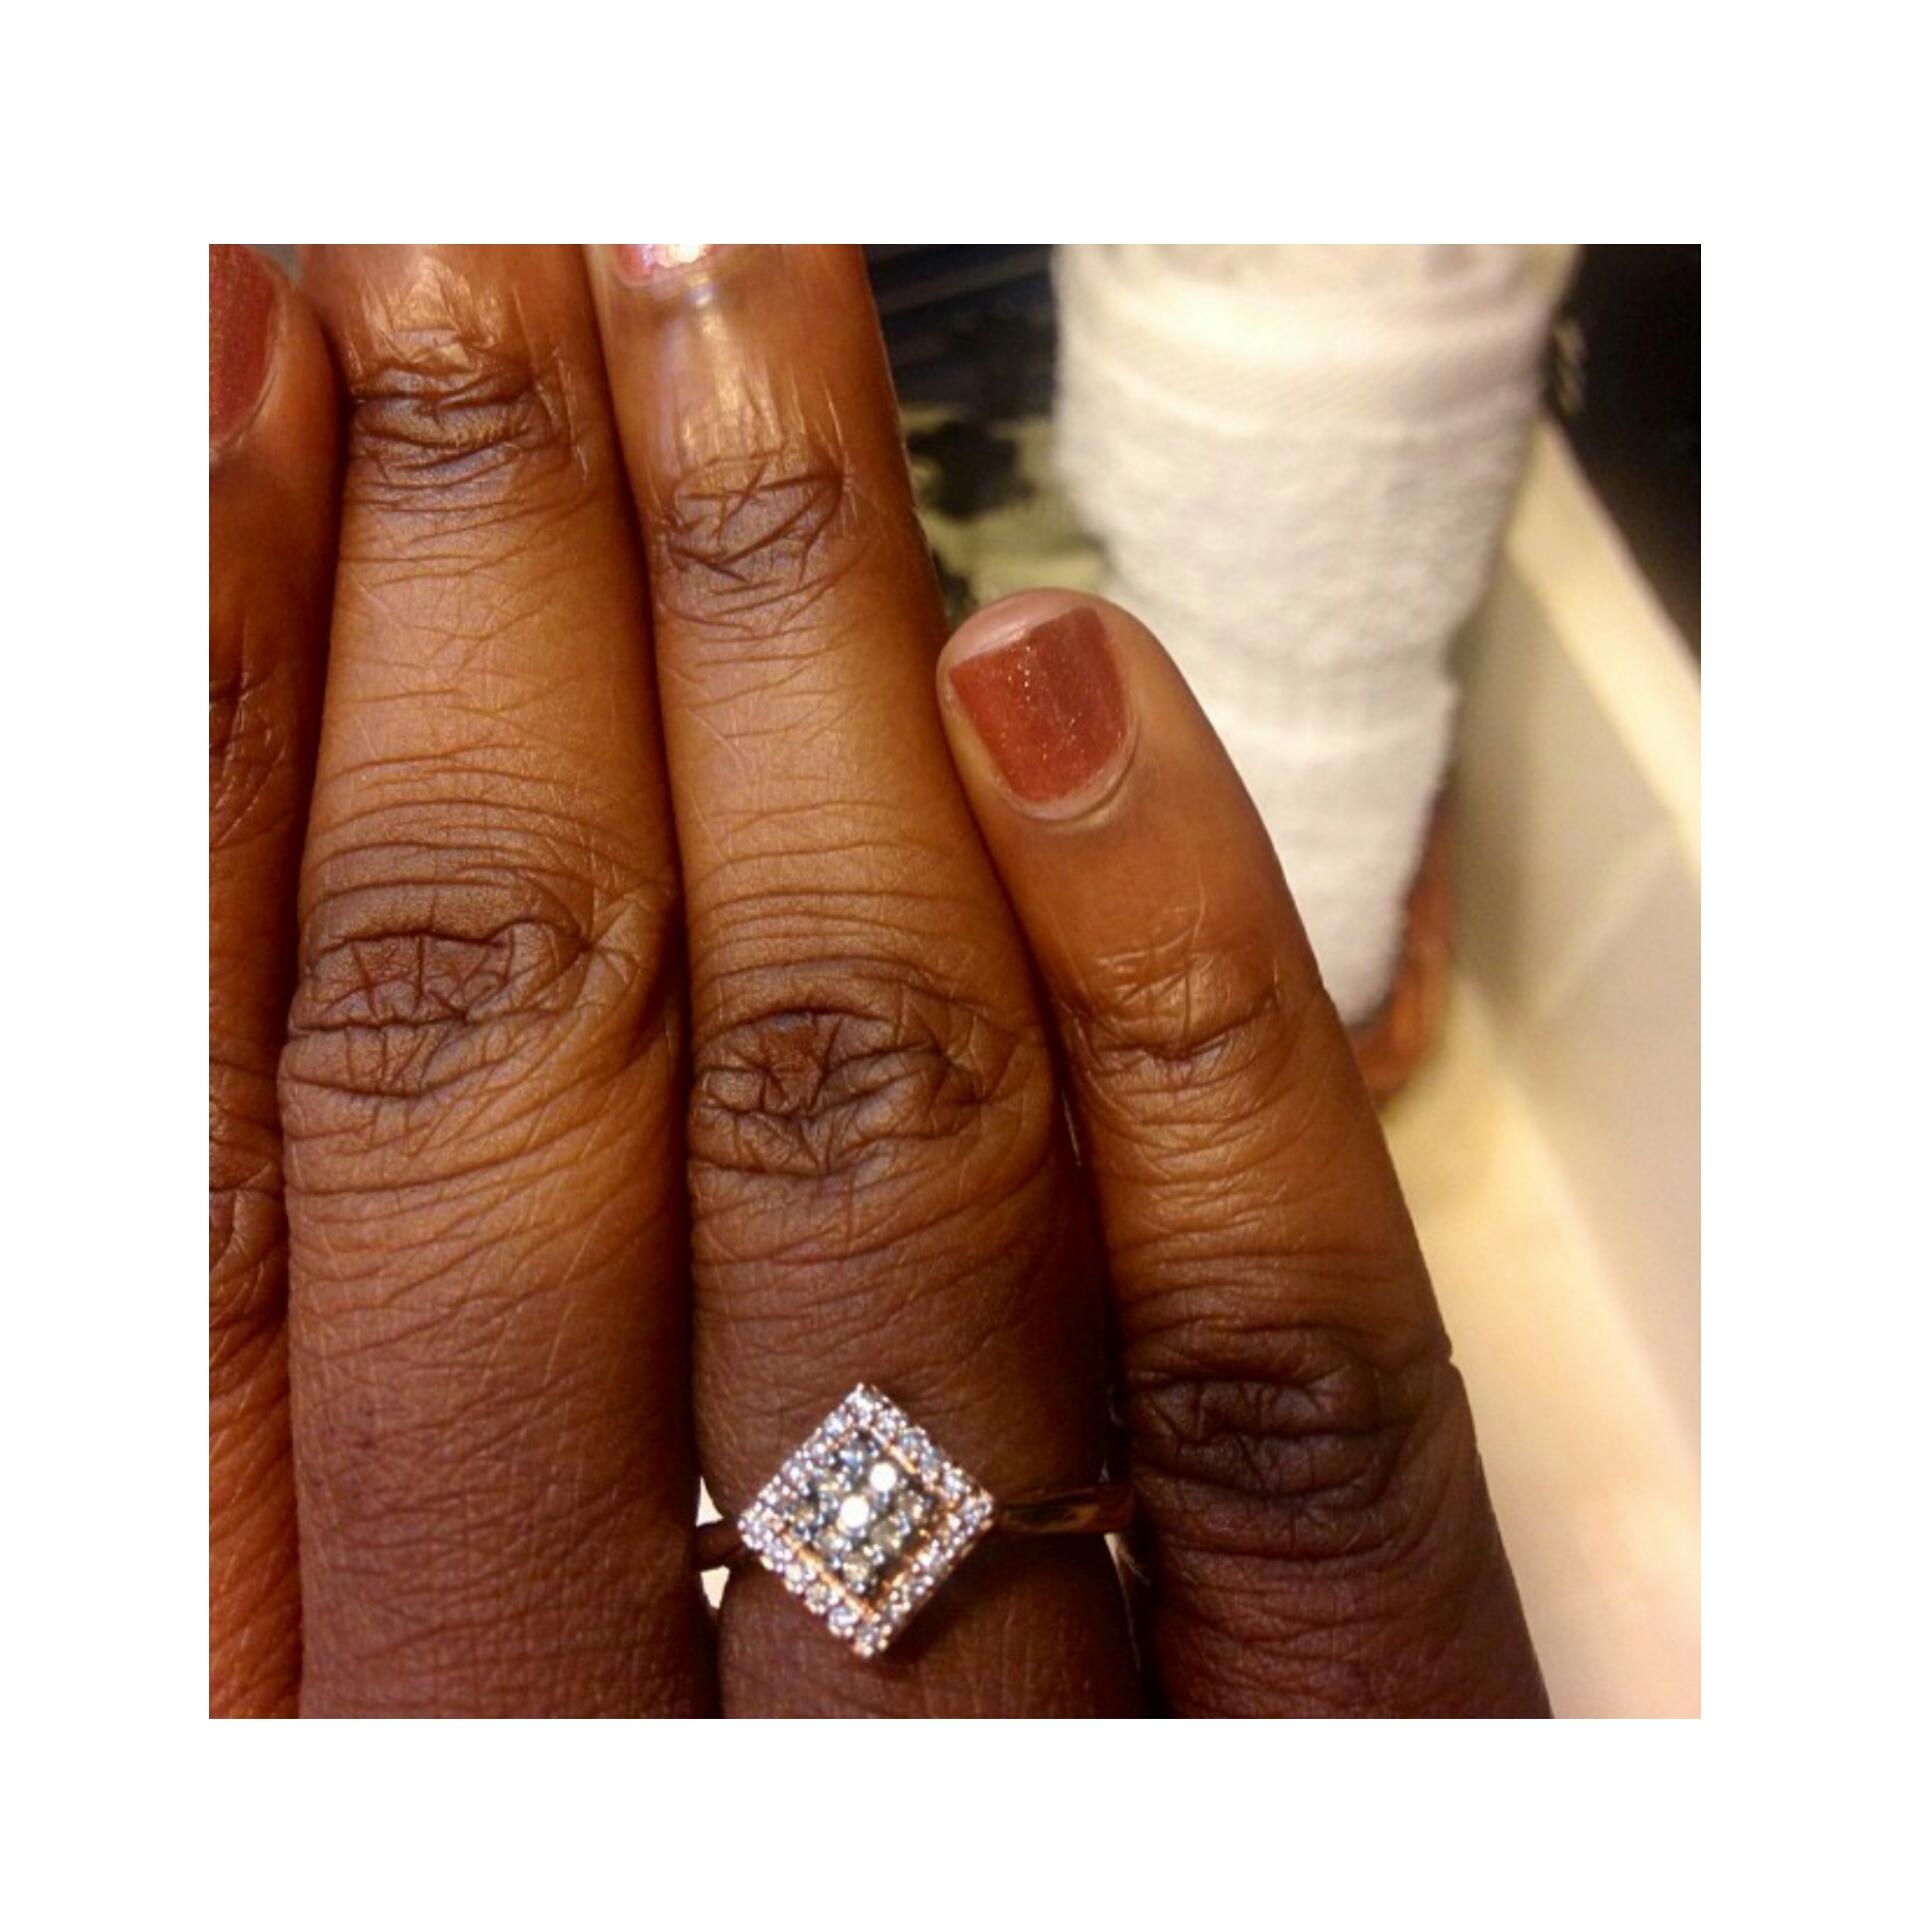 14k Rose Gold Ring w/ Chocolate & White Diamonds - St. Thomas U.S.V.I